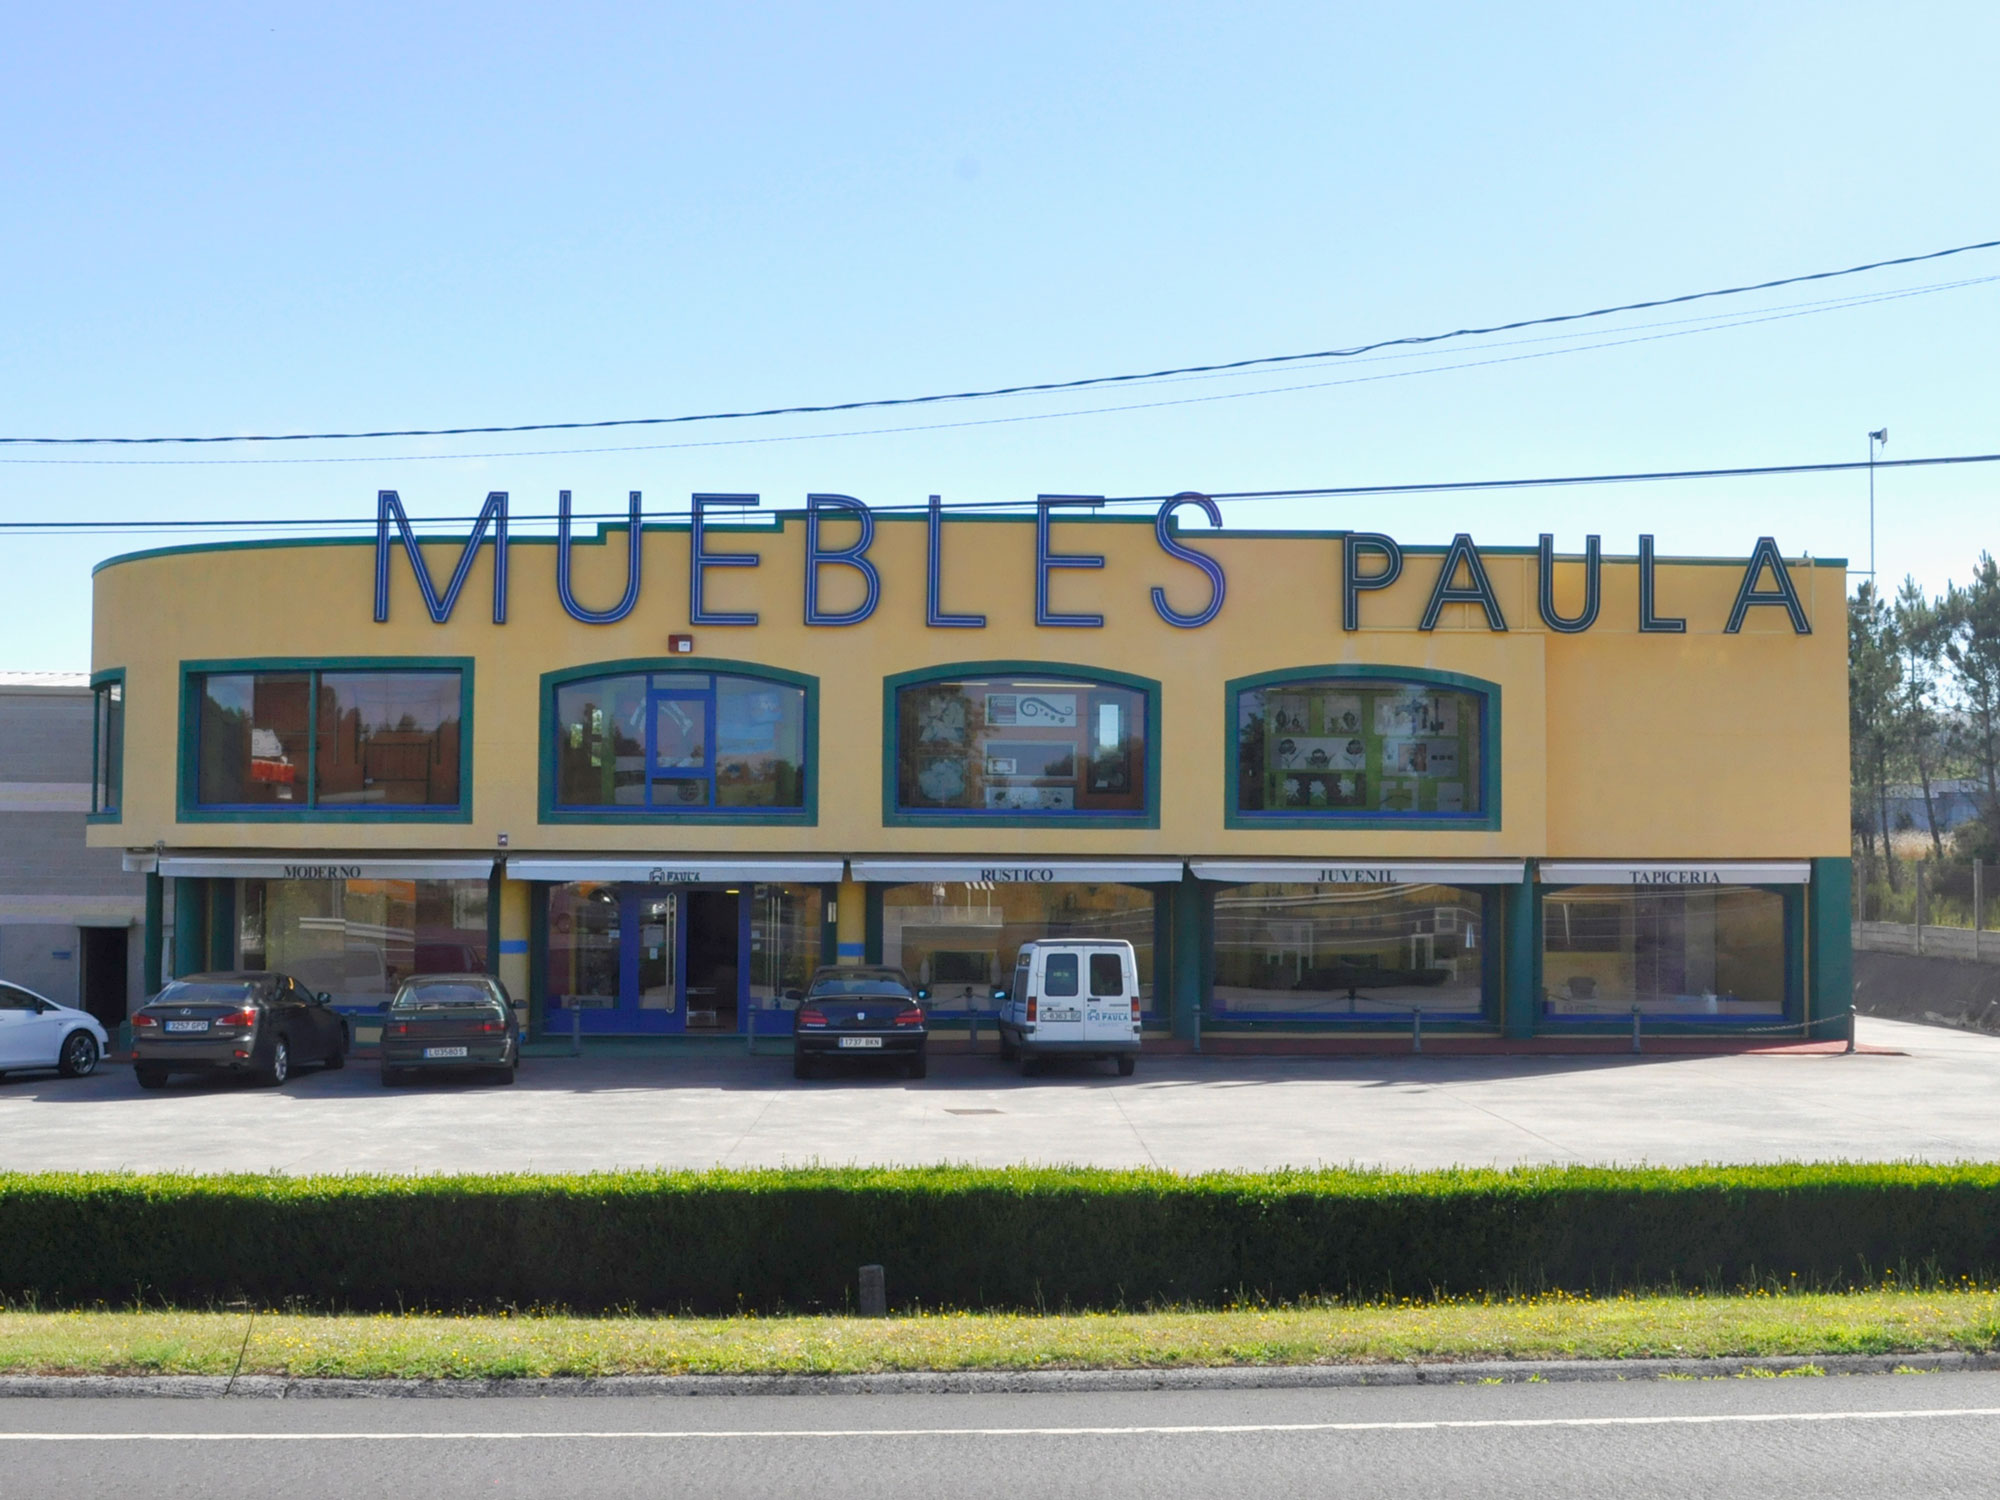 Muebles Paula Melide - Muebles Paula Asetem Asociaci N Empresarios Terra De Melide[mjhdah]https://storage.googleapis.com/idx-photos-gs.ihouseprd.com/MO-GSBOR/60093174/org/003.jpg